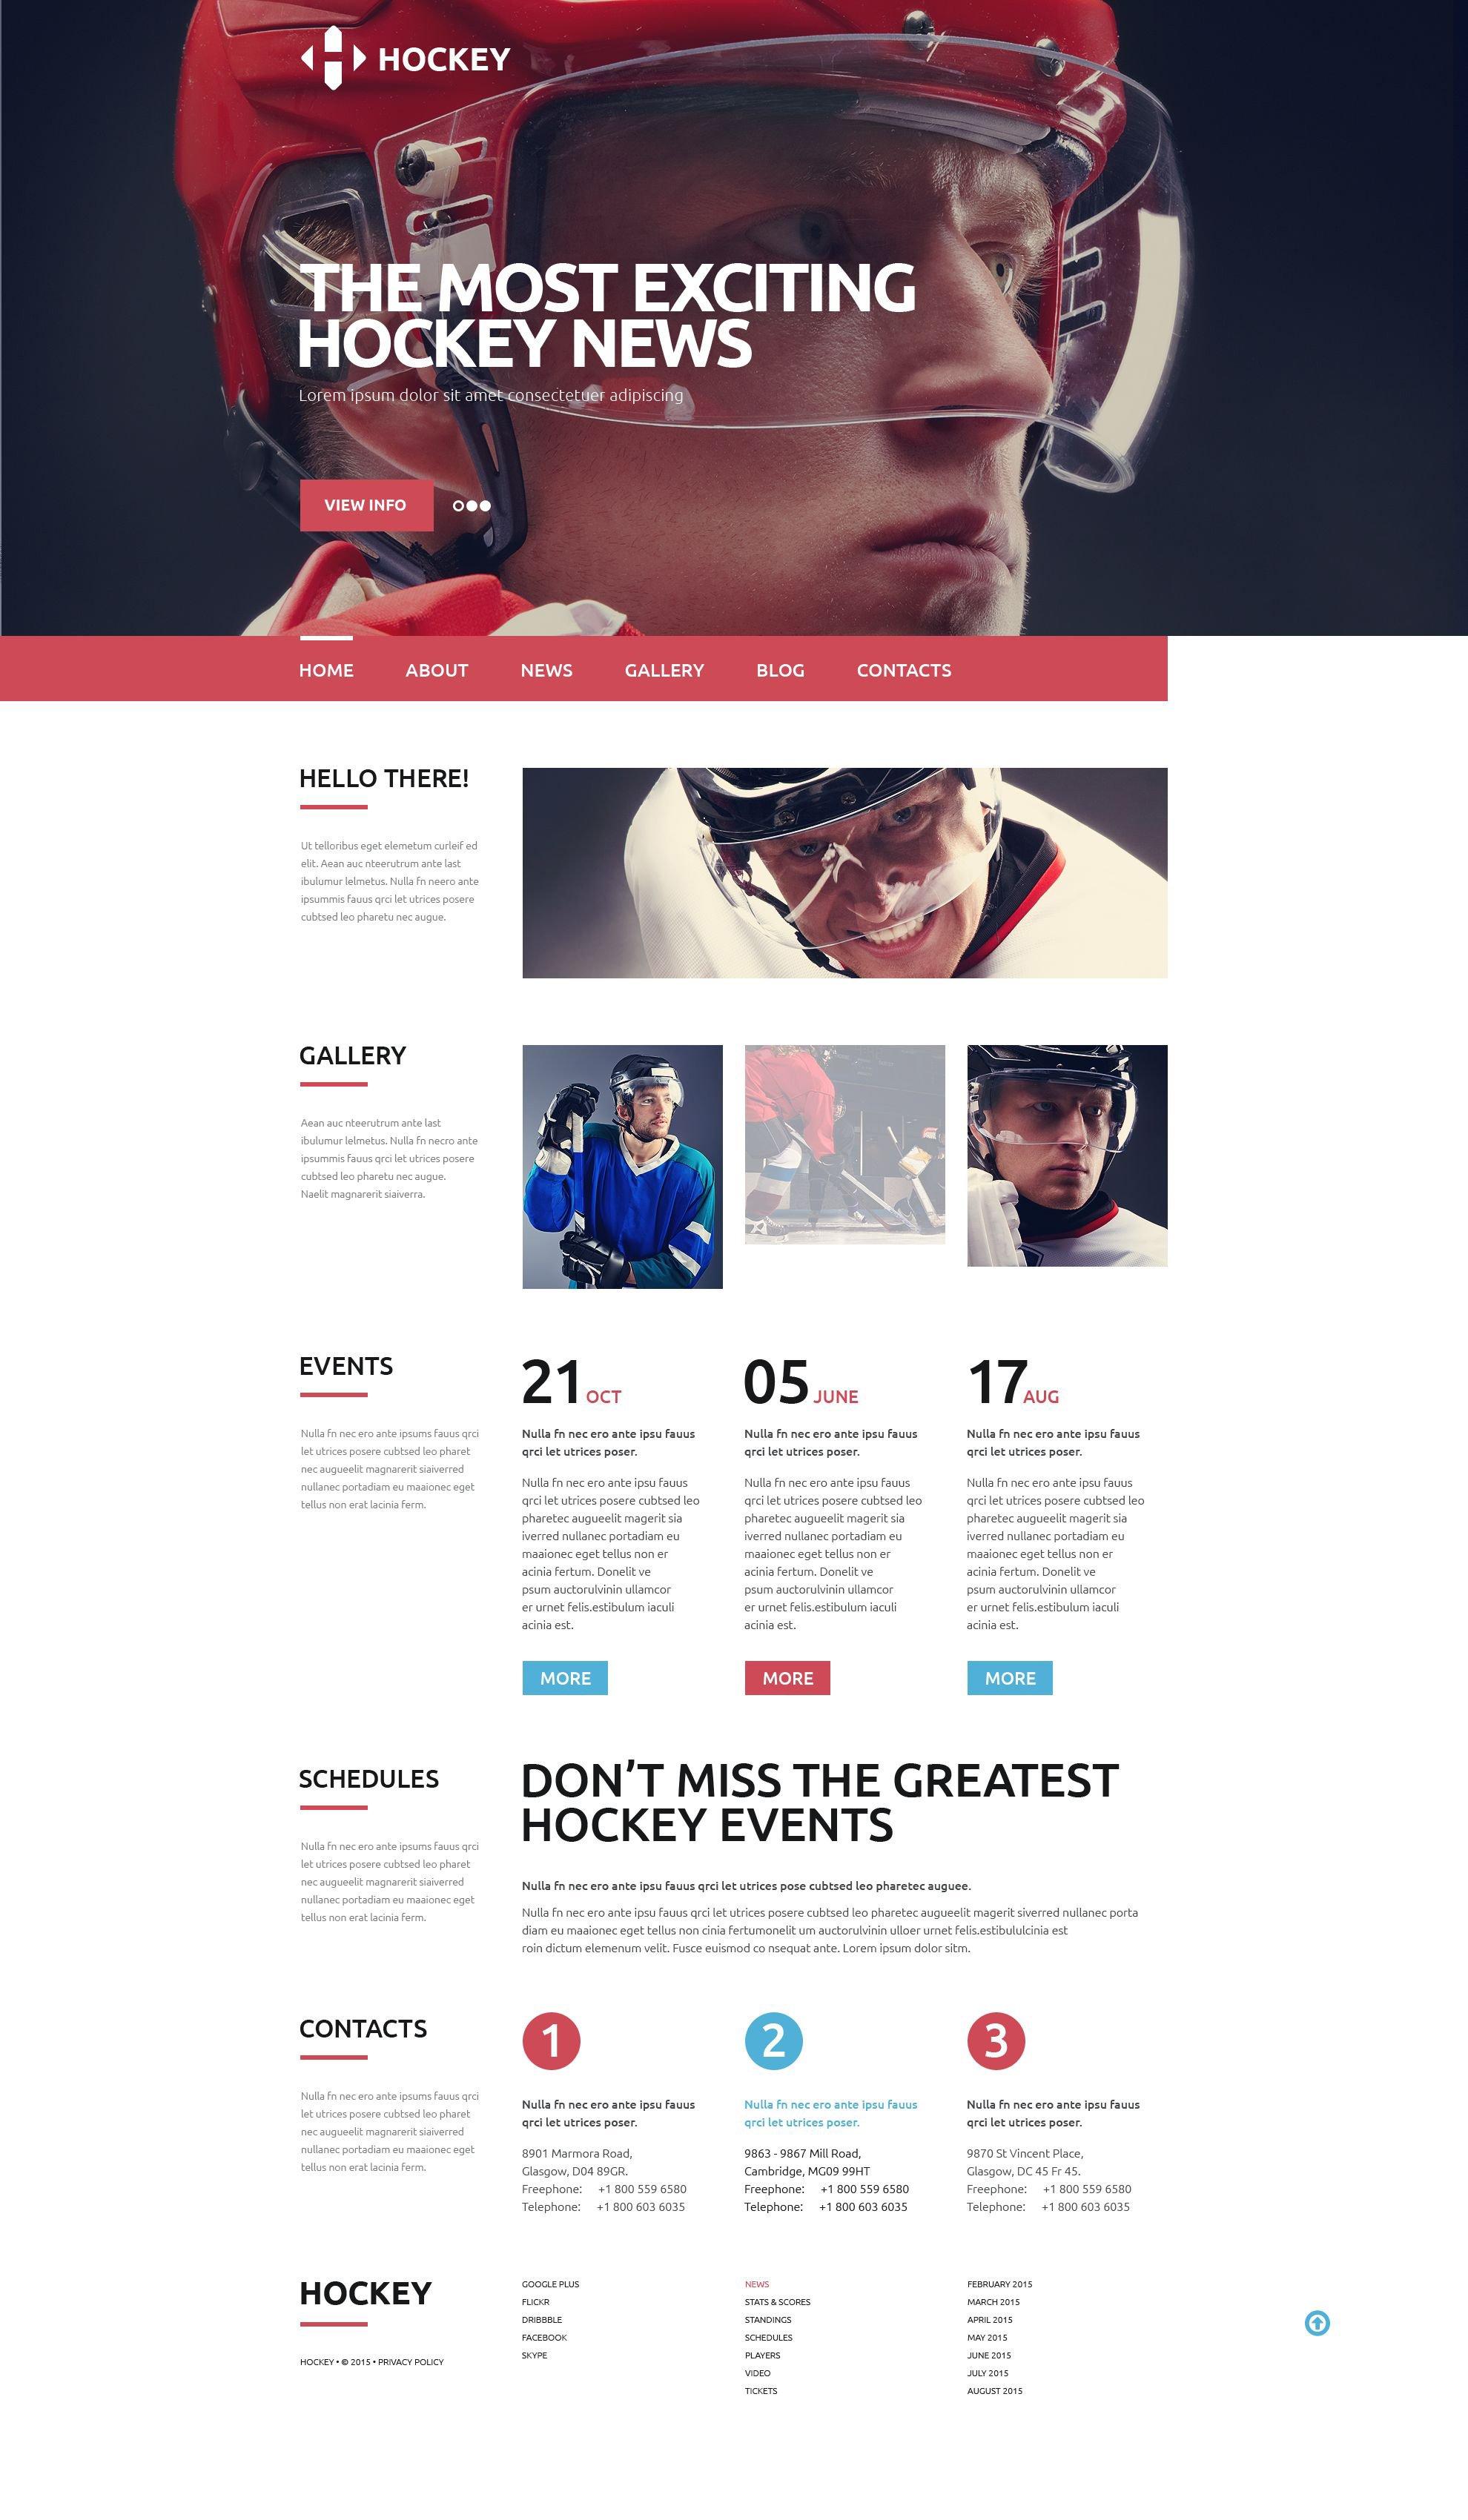 Hockey News Portal Website Template